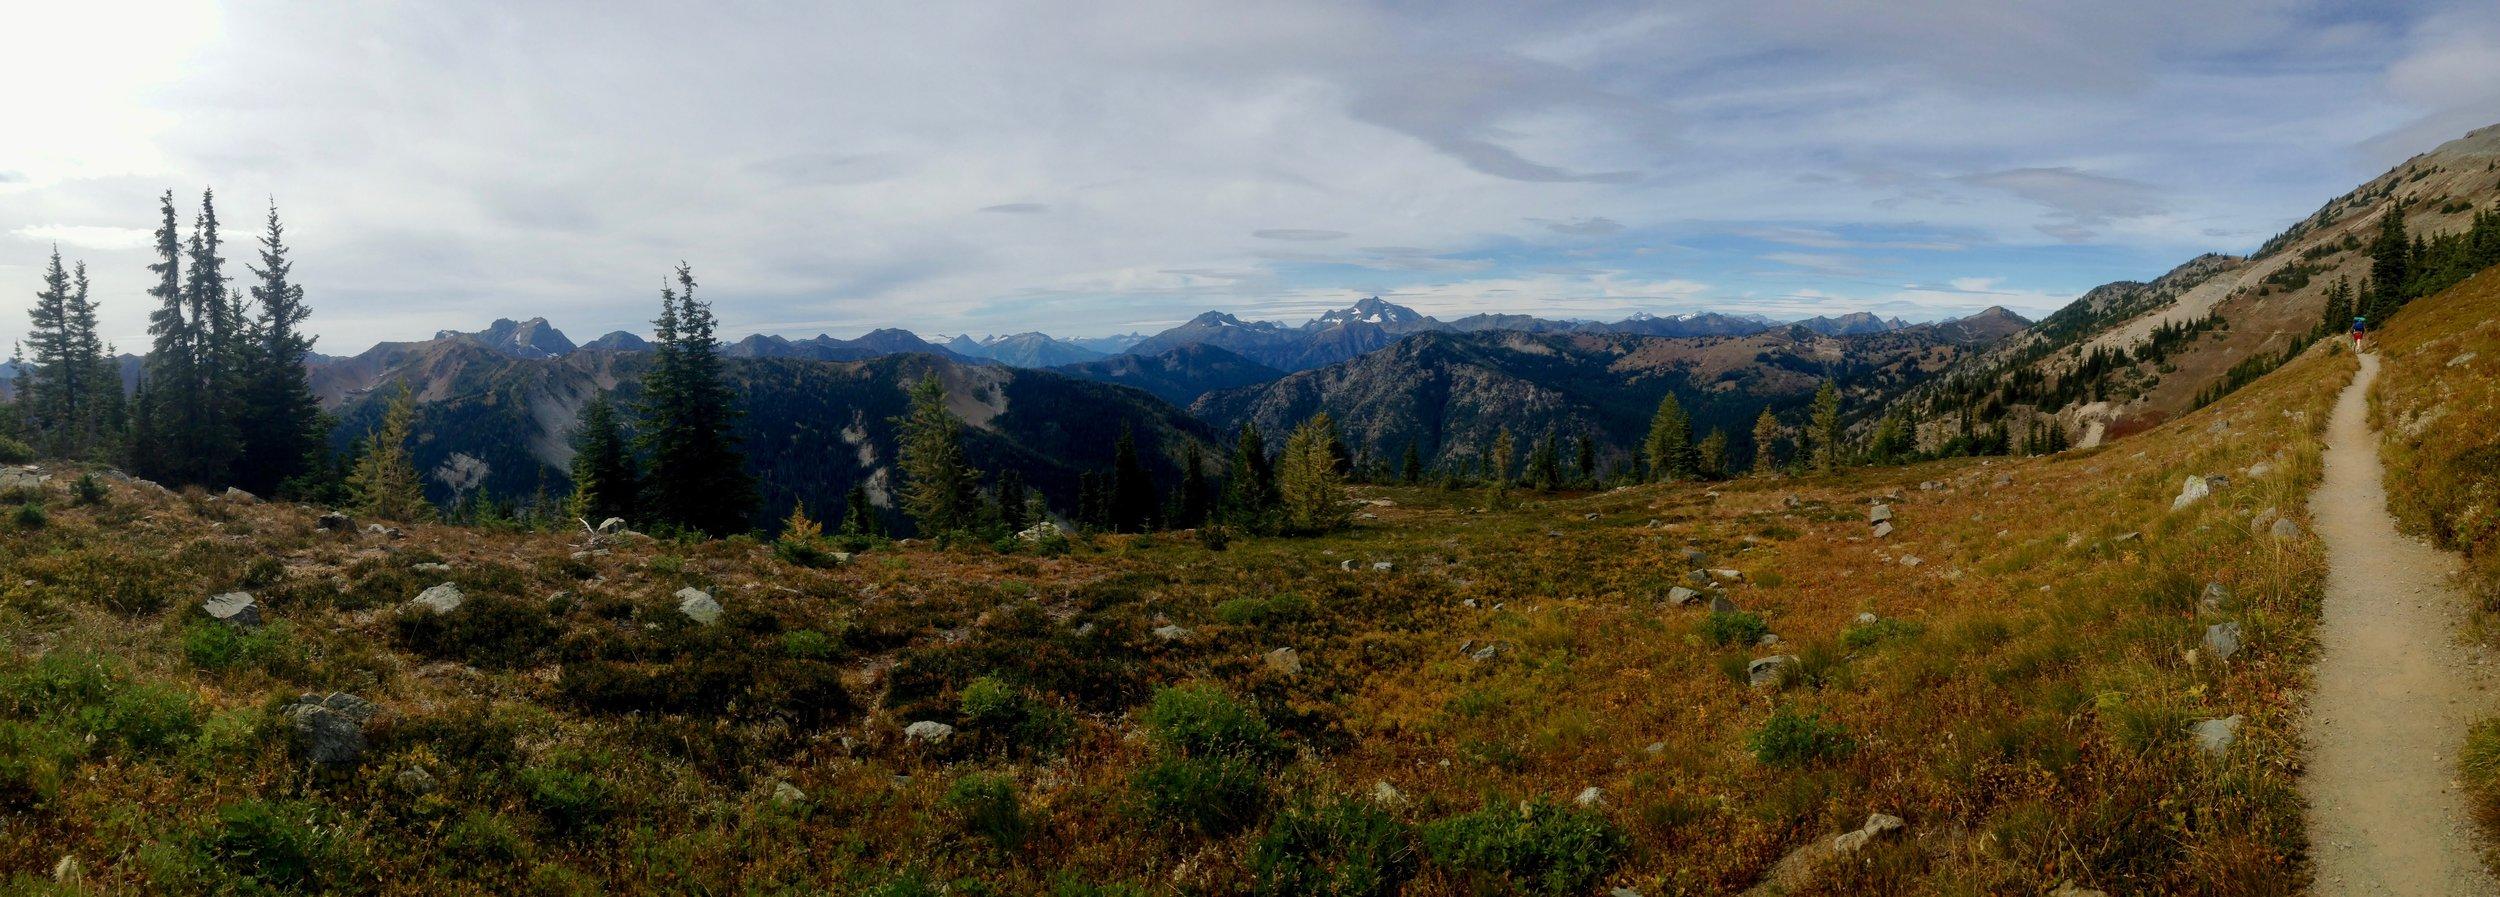 Okanogan-Wenatchee National Forest, WA